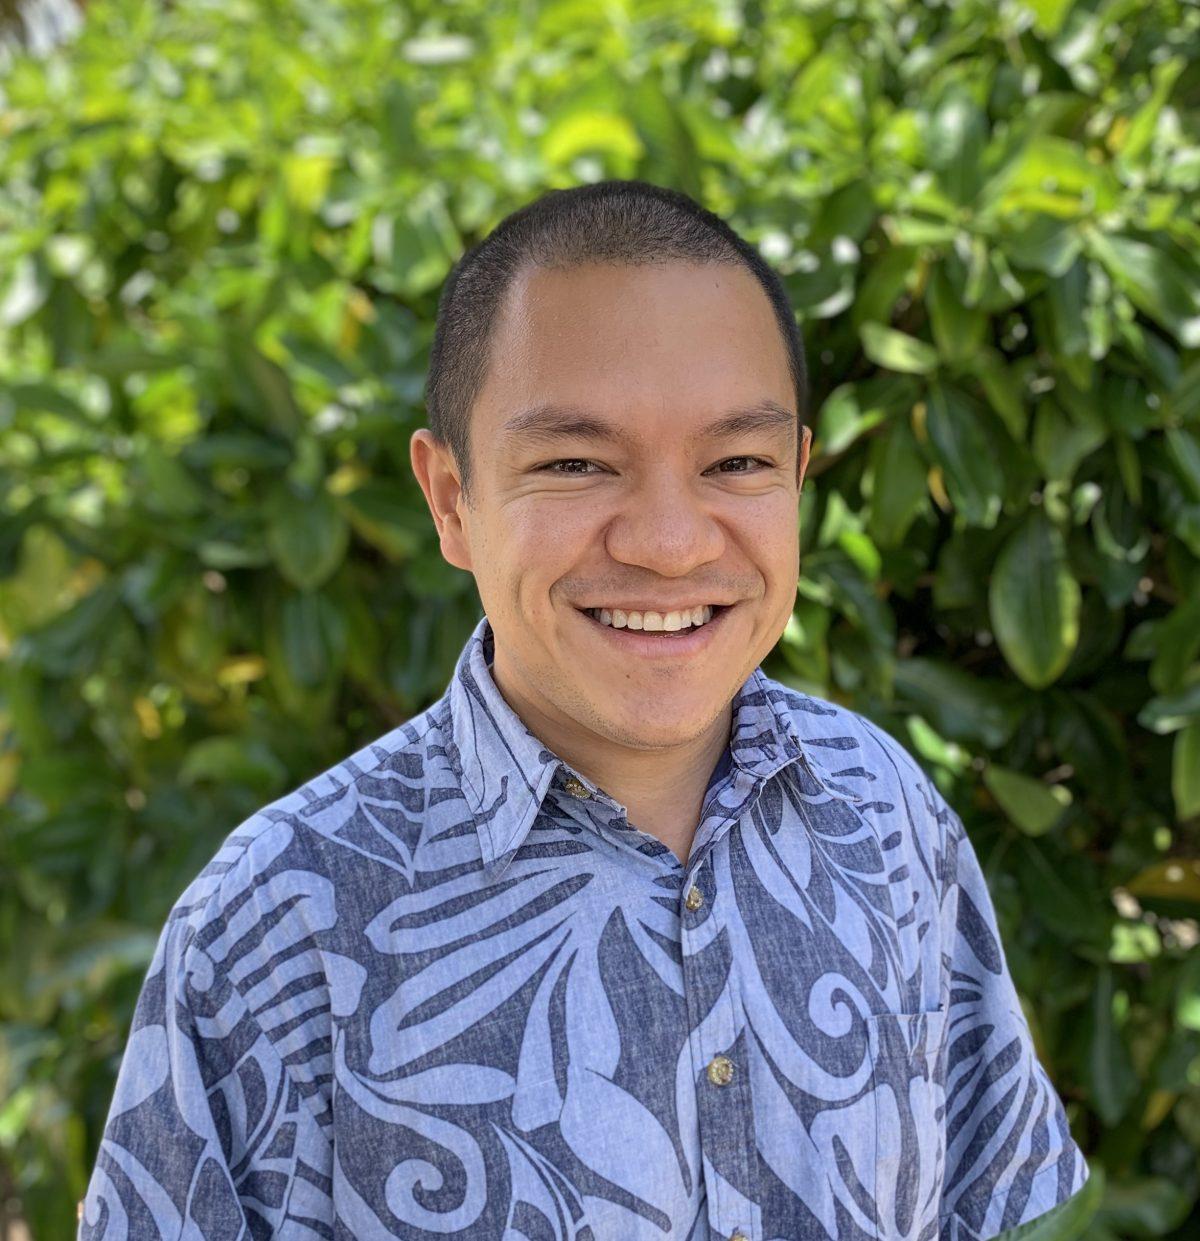 Sean Nagamatsu